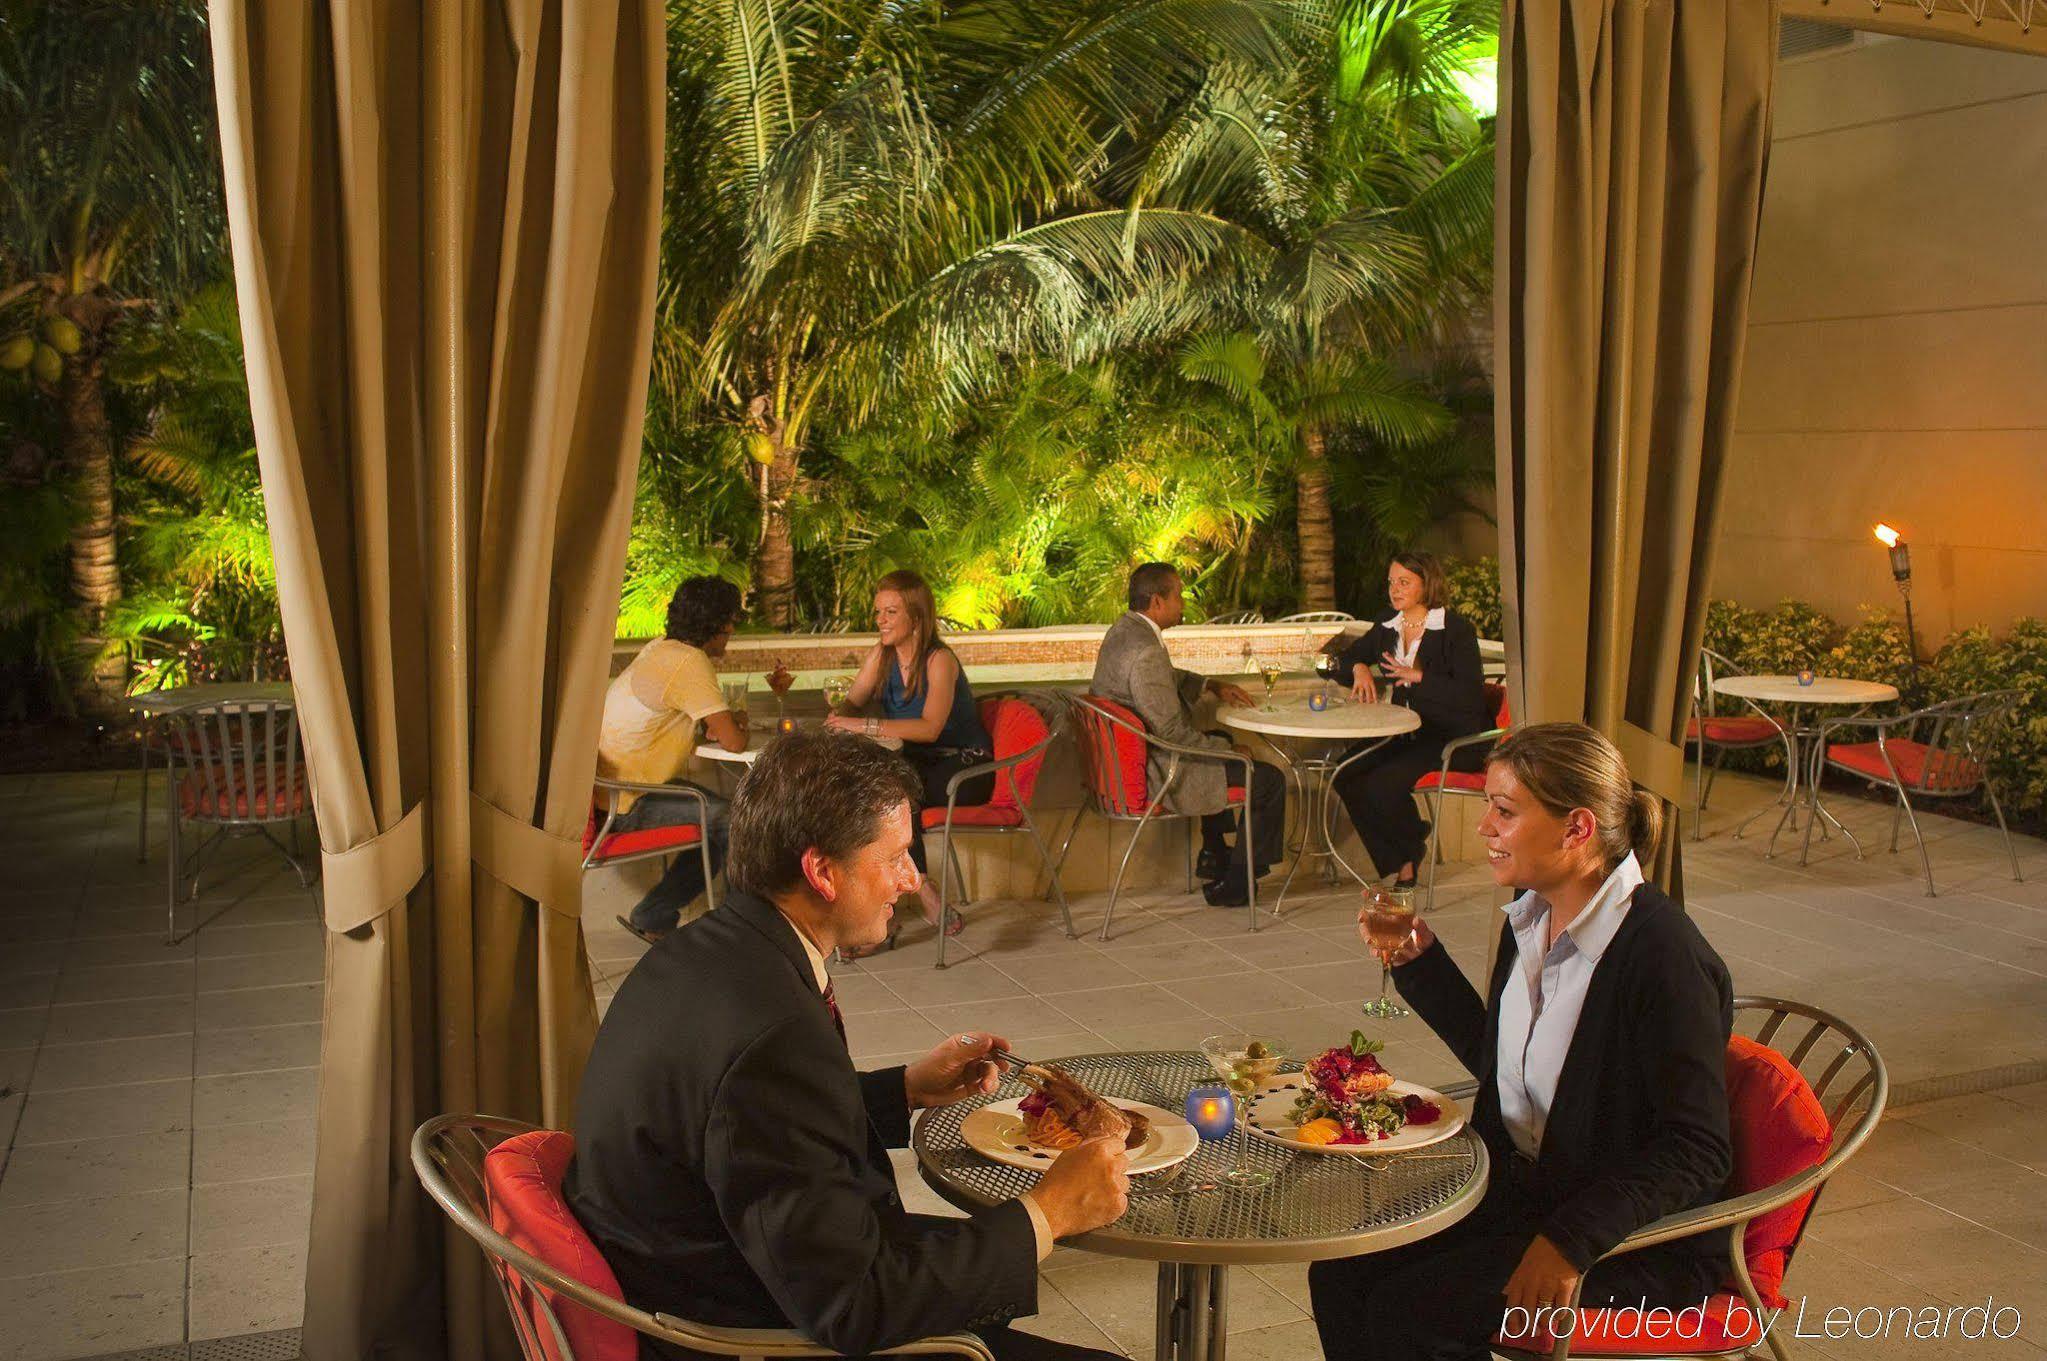 Hilton Garden Inn West Palm Beach Airport